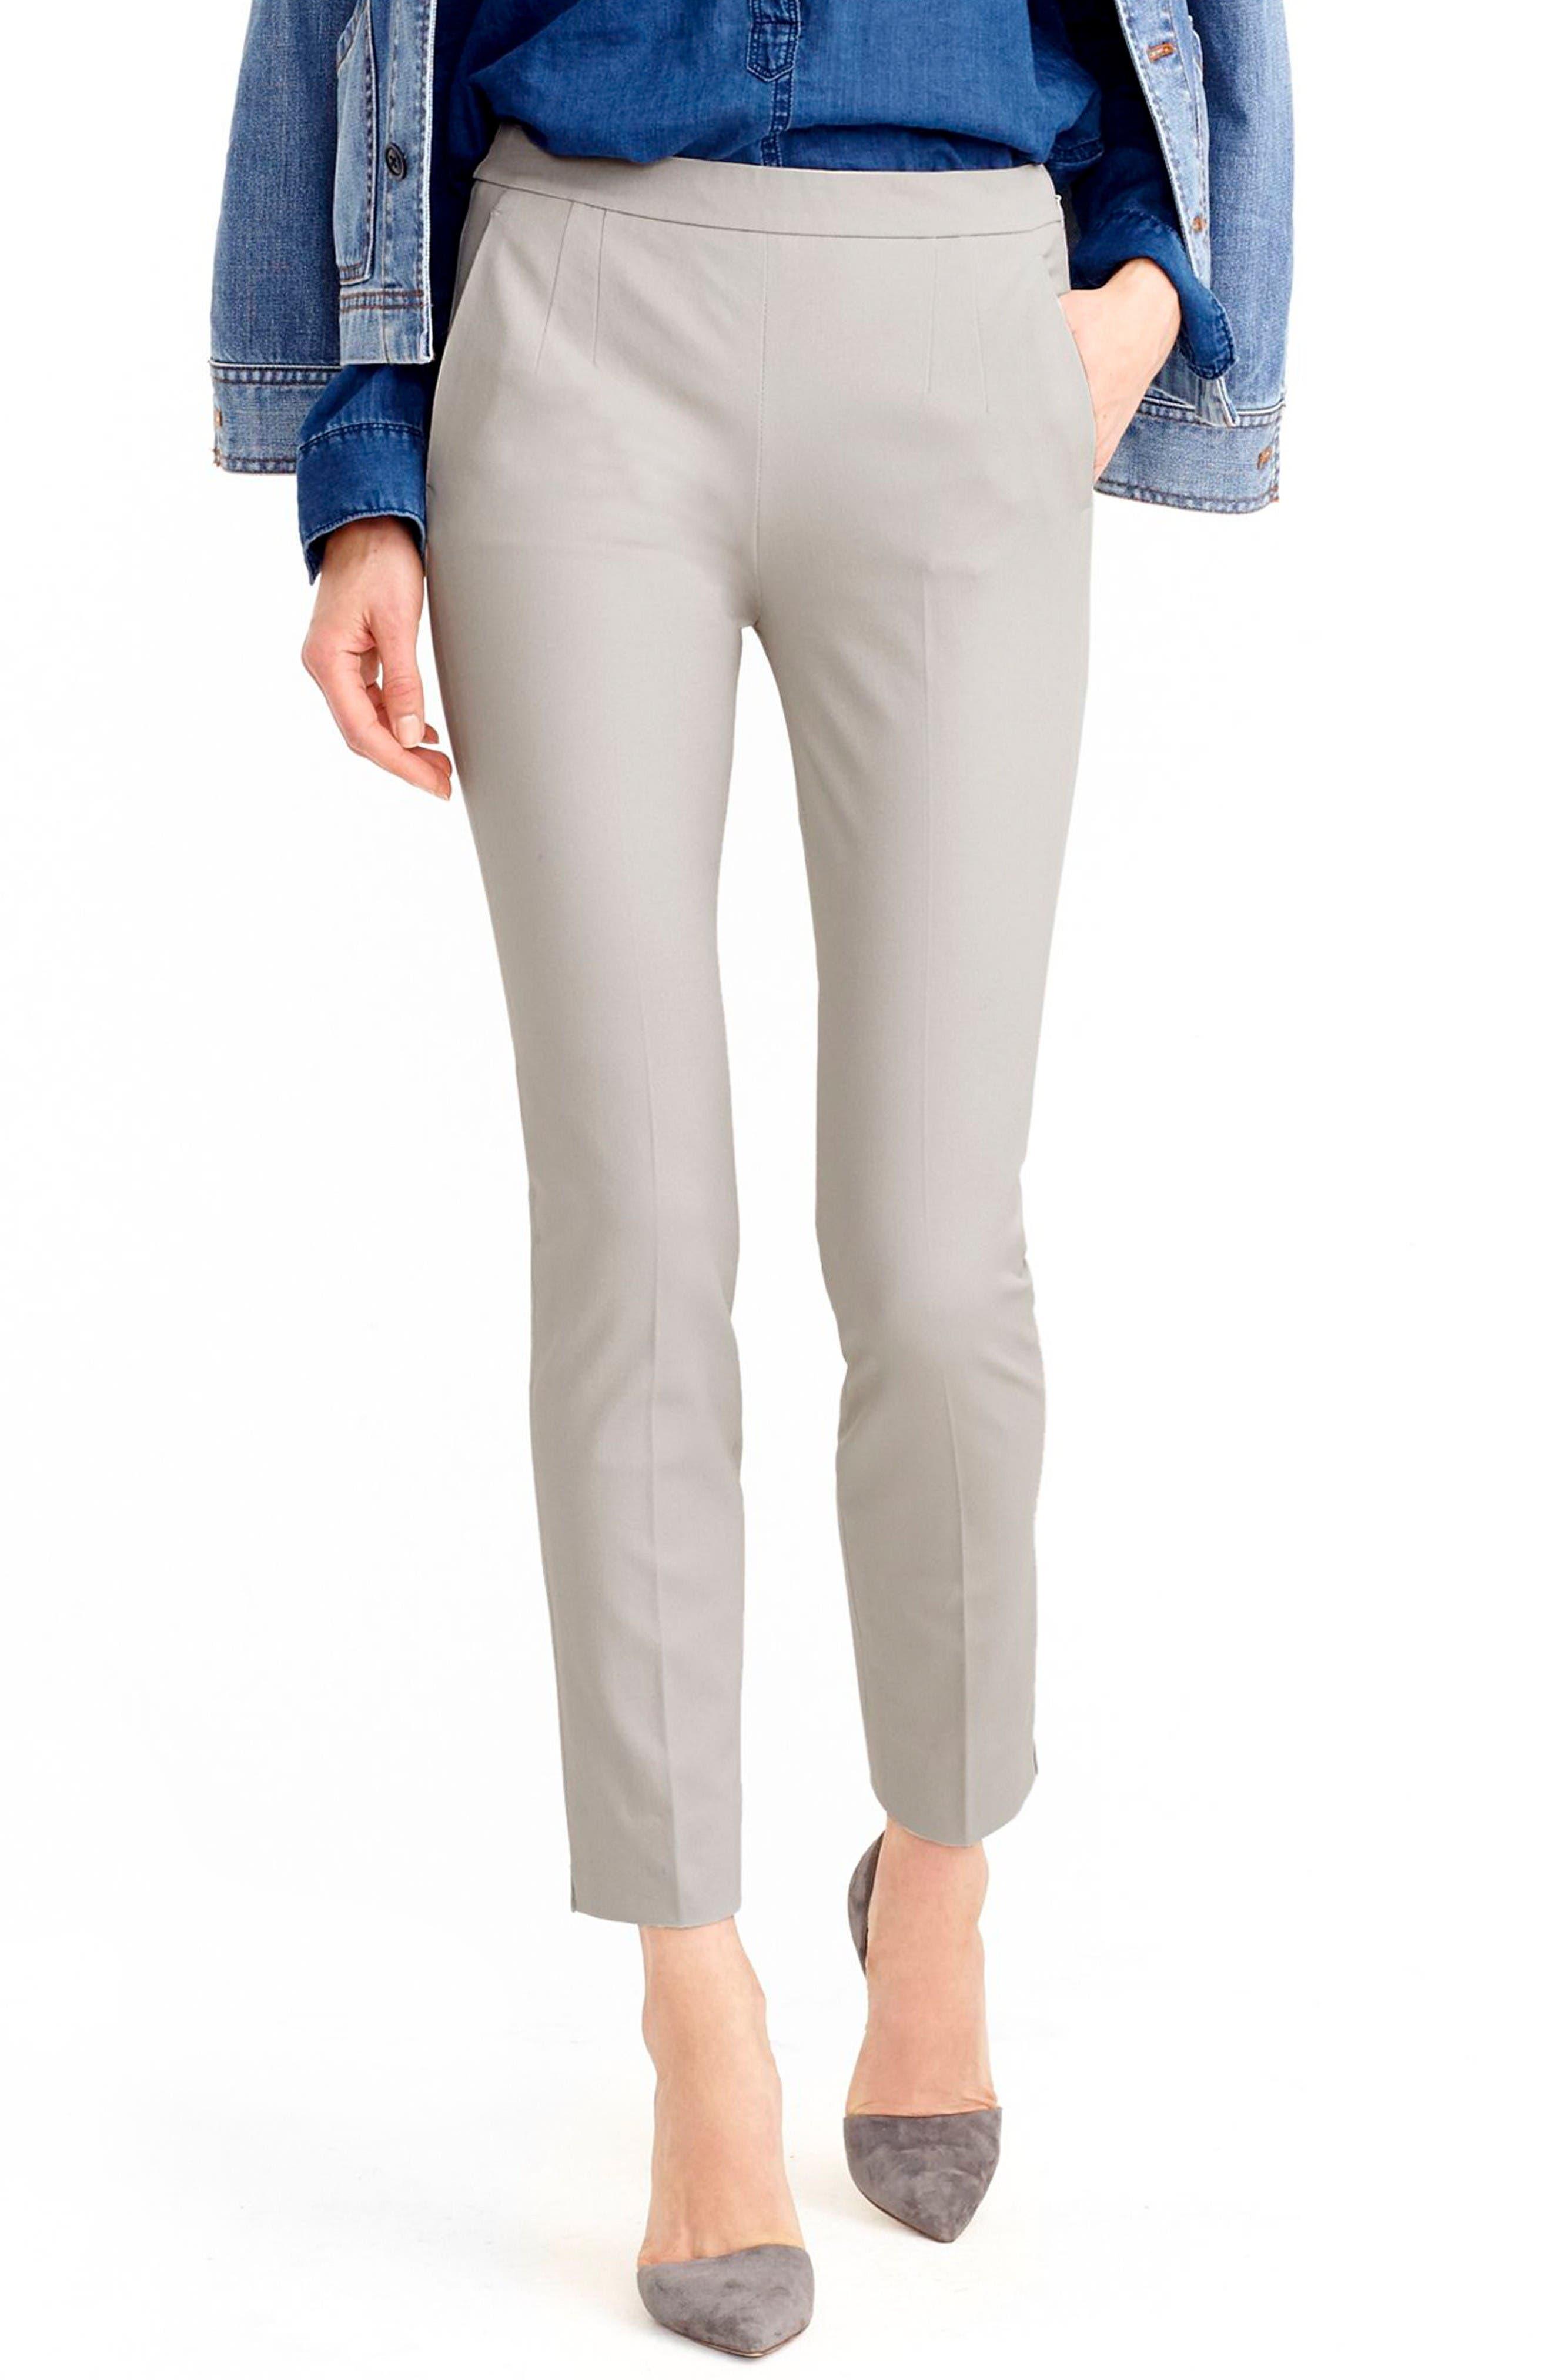 Alternate Image 1 Selected - J.Crew 'Martie' Bi-Stretch Cotton Blend Pants (Regular & Petite)